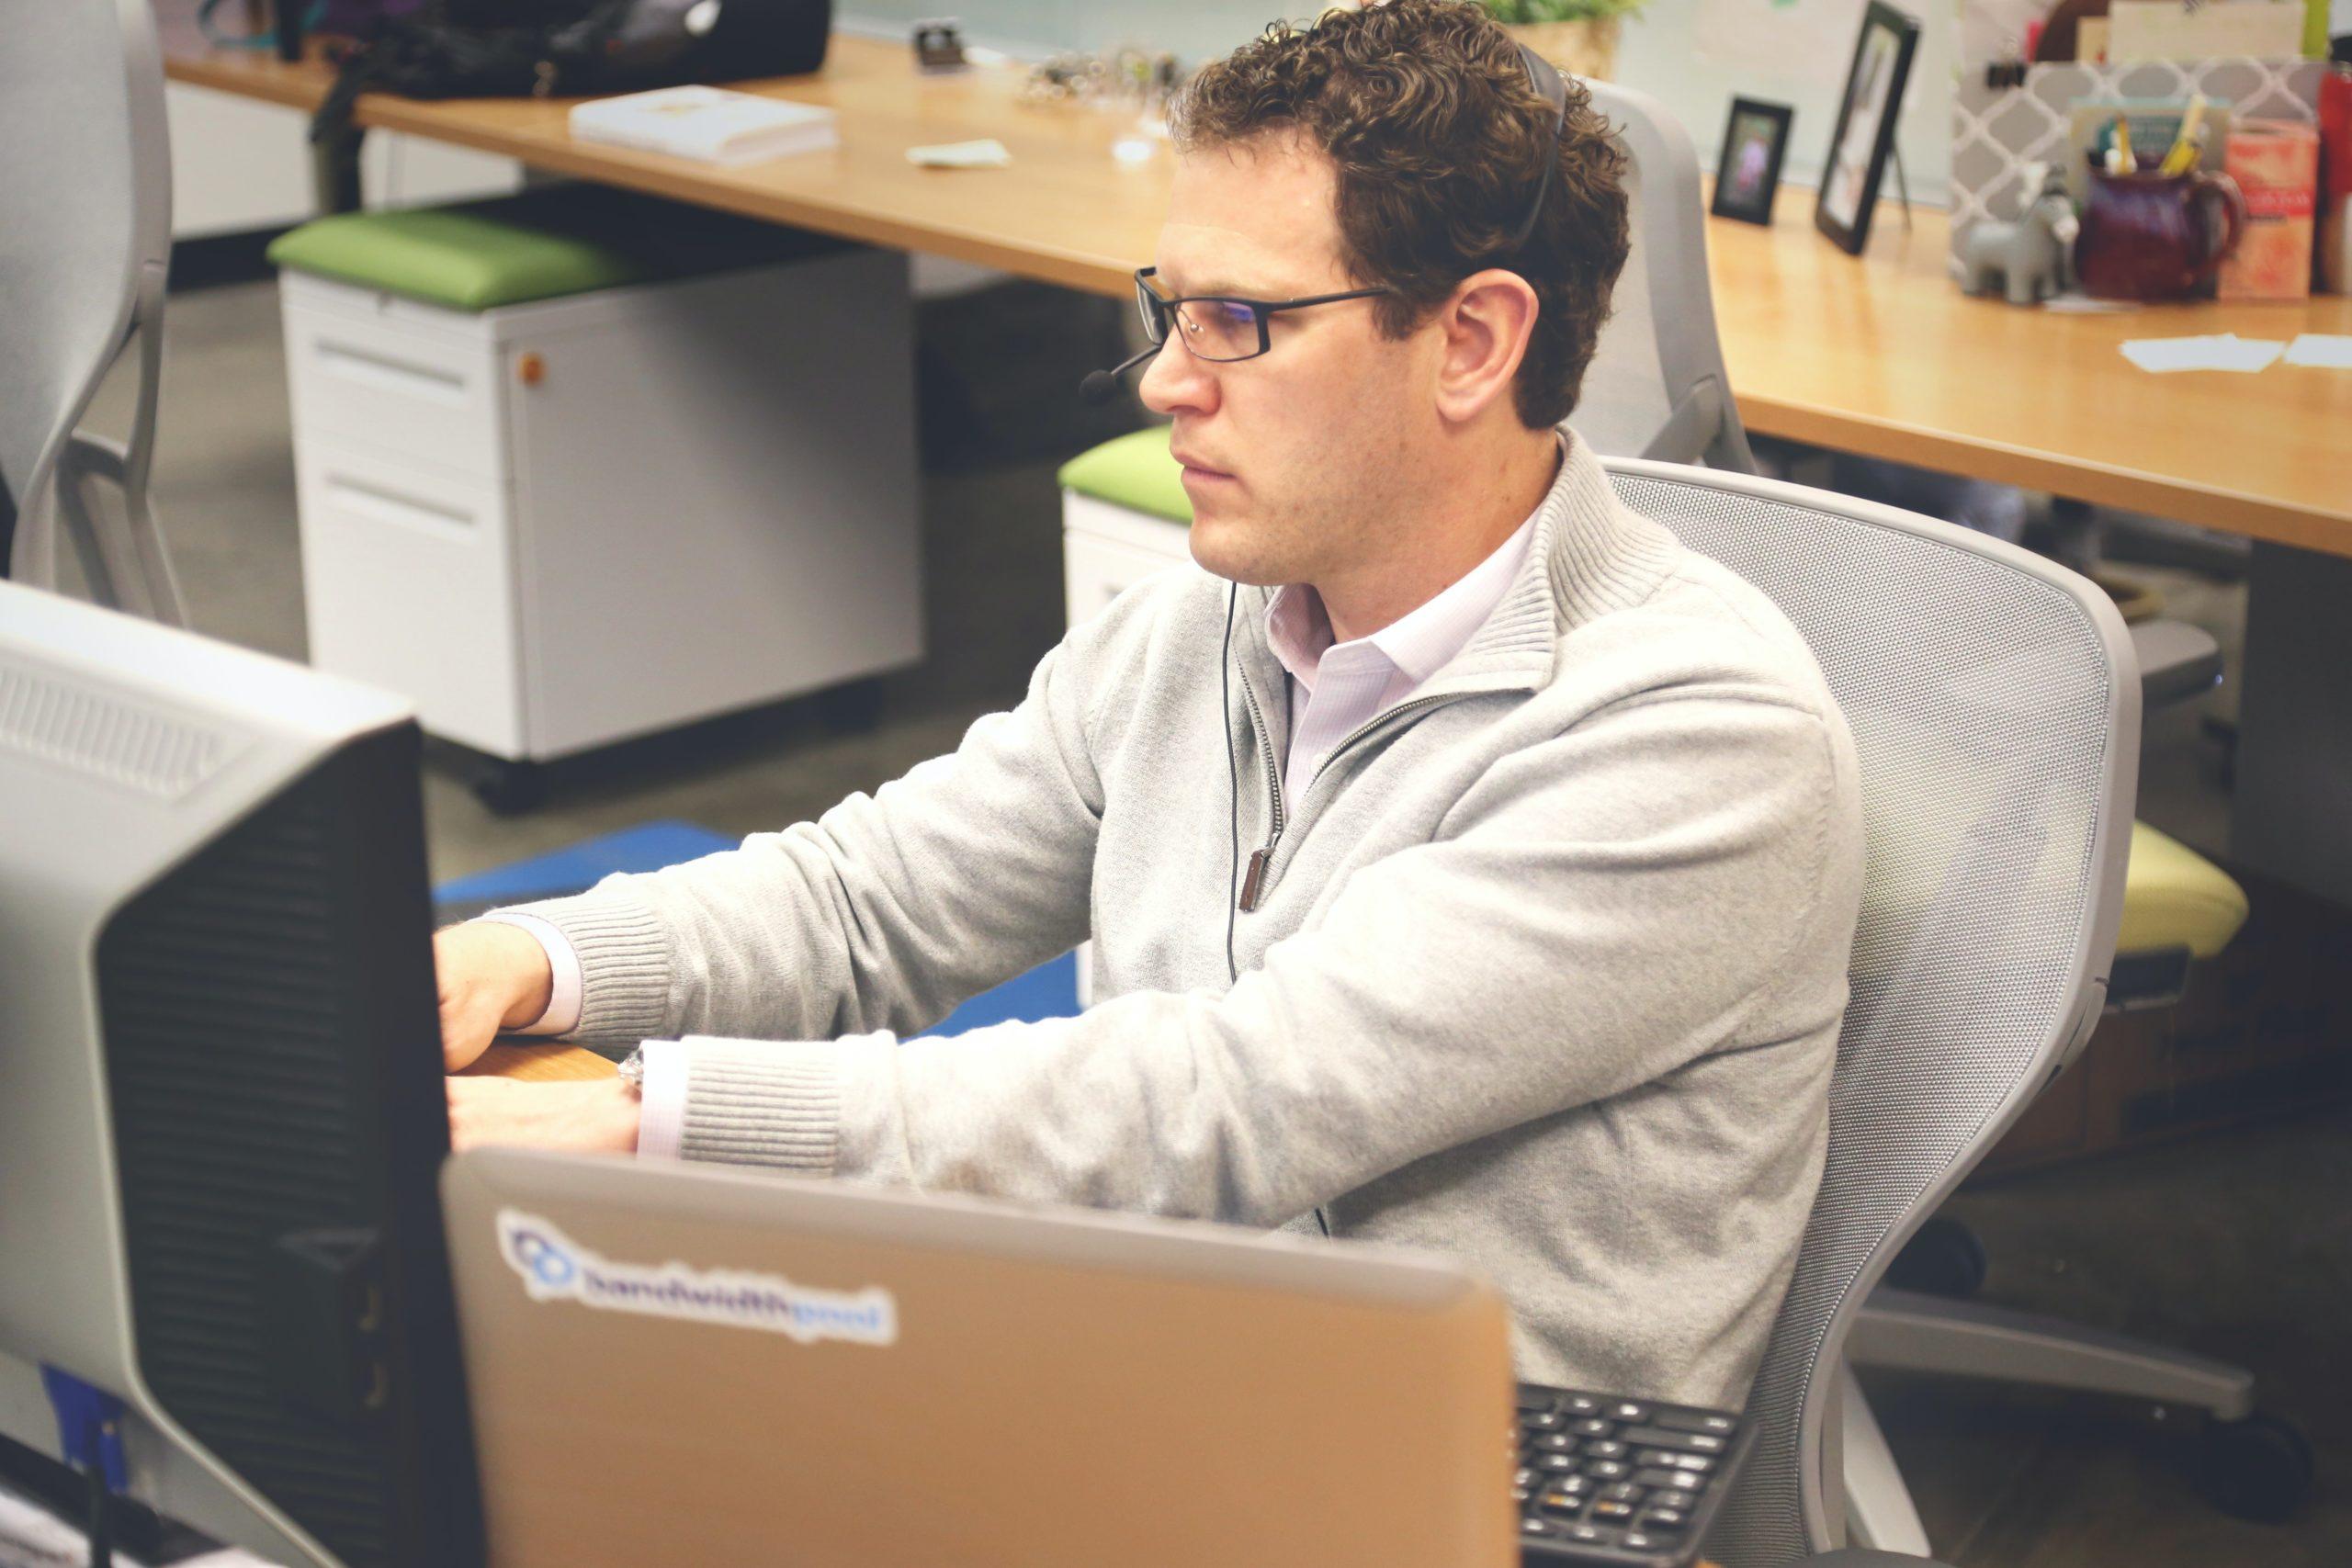 desk-office-workspace-coworking-7110